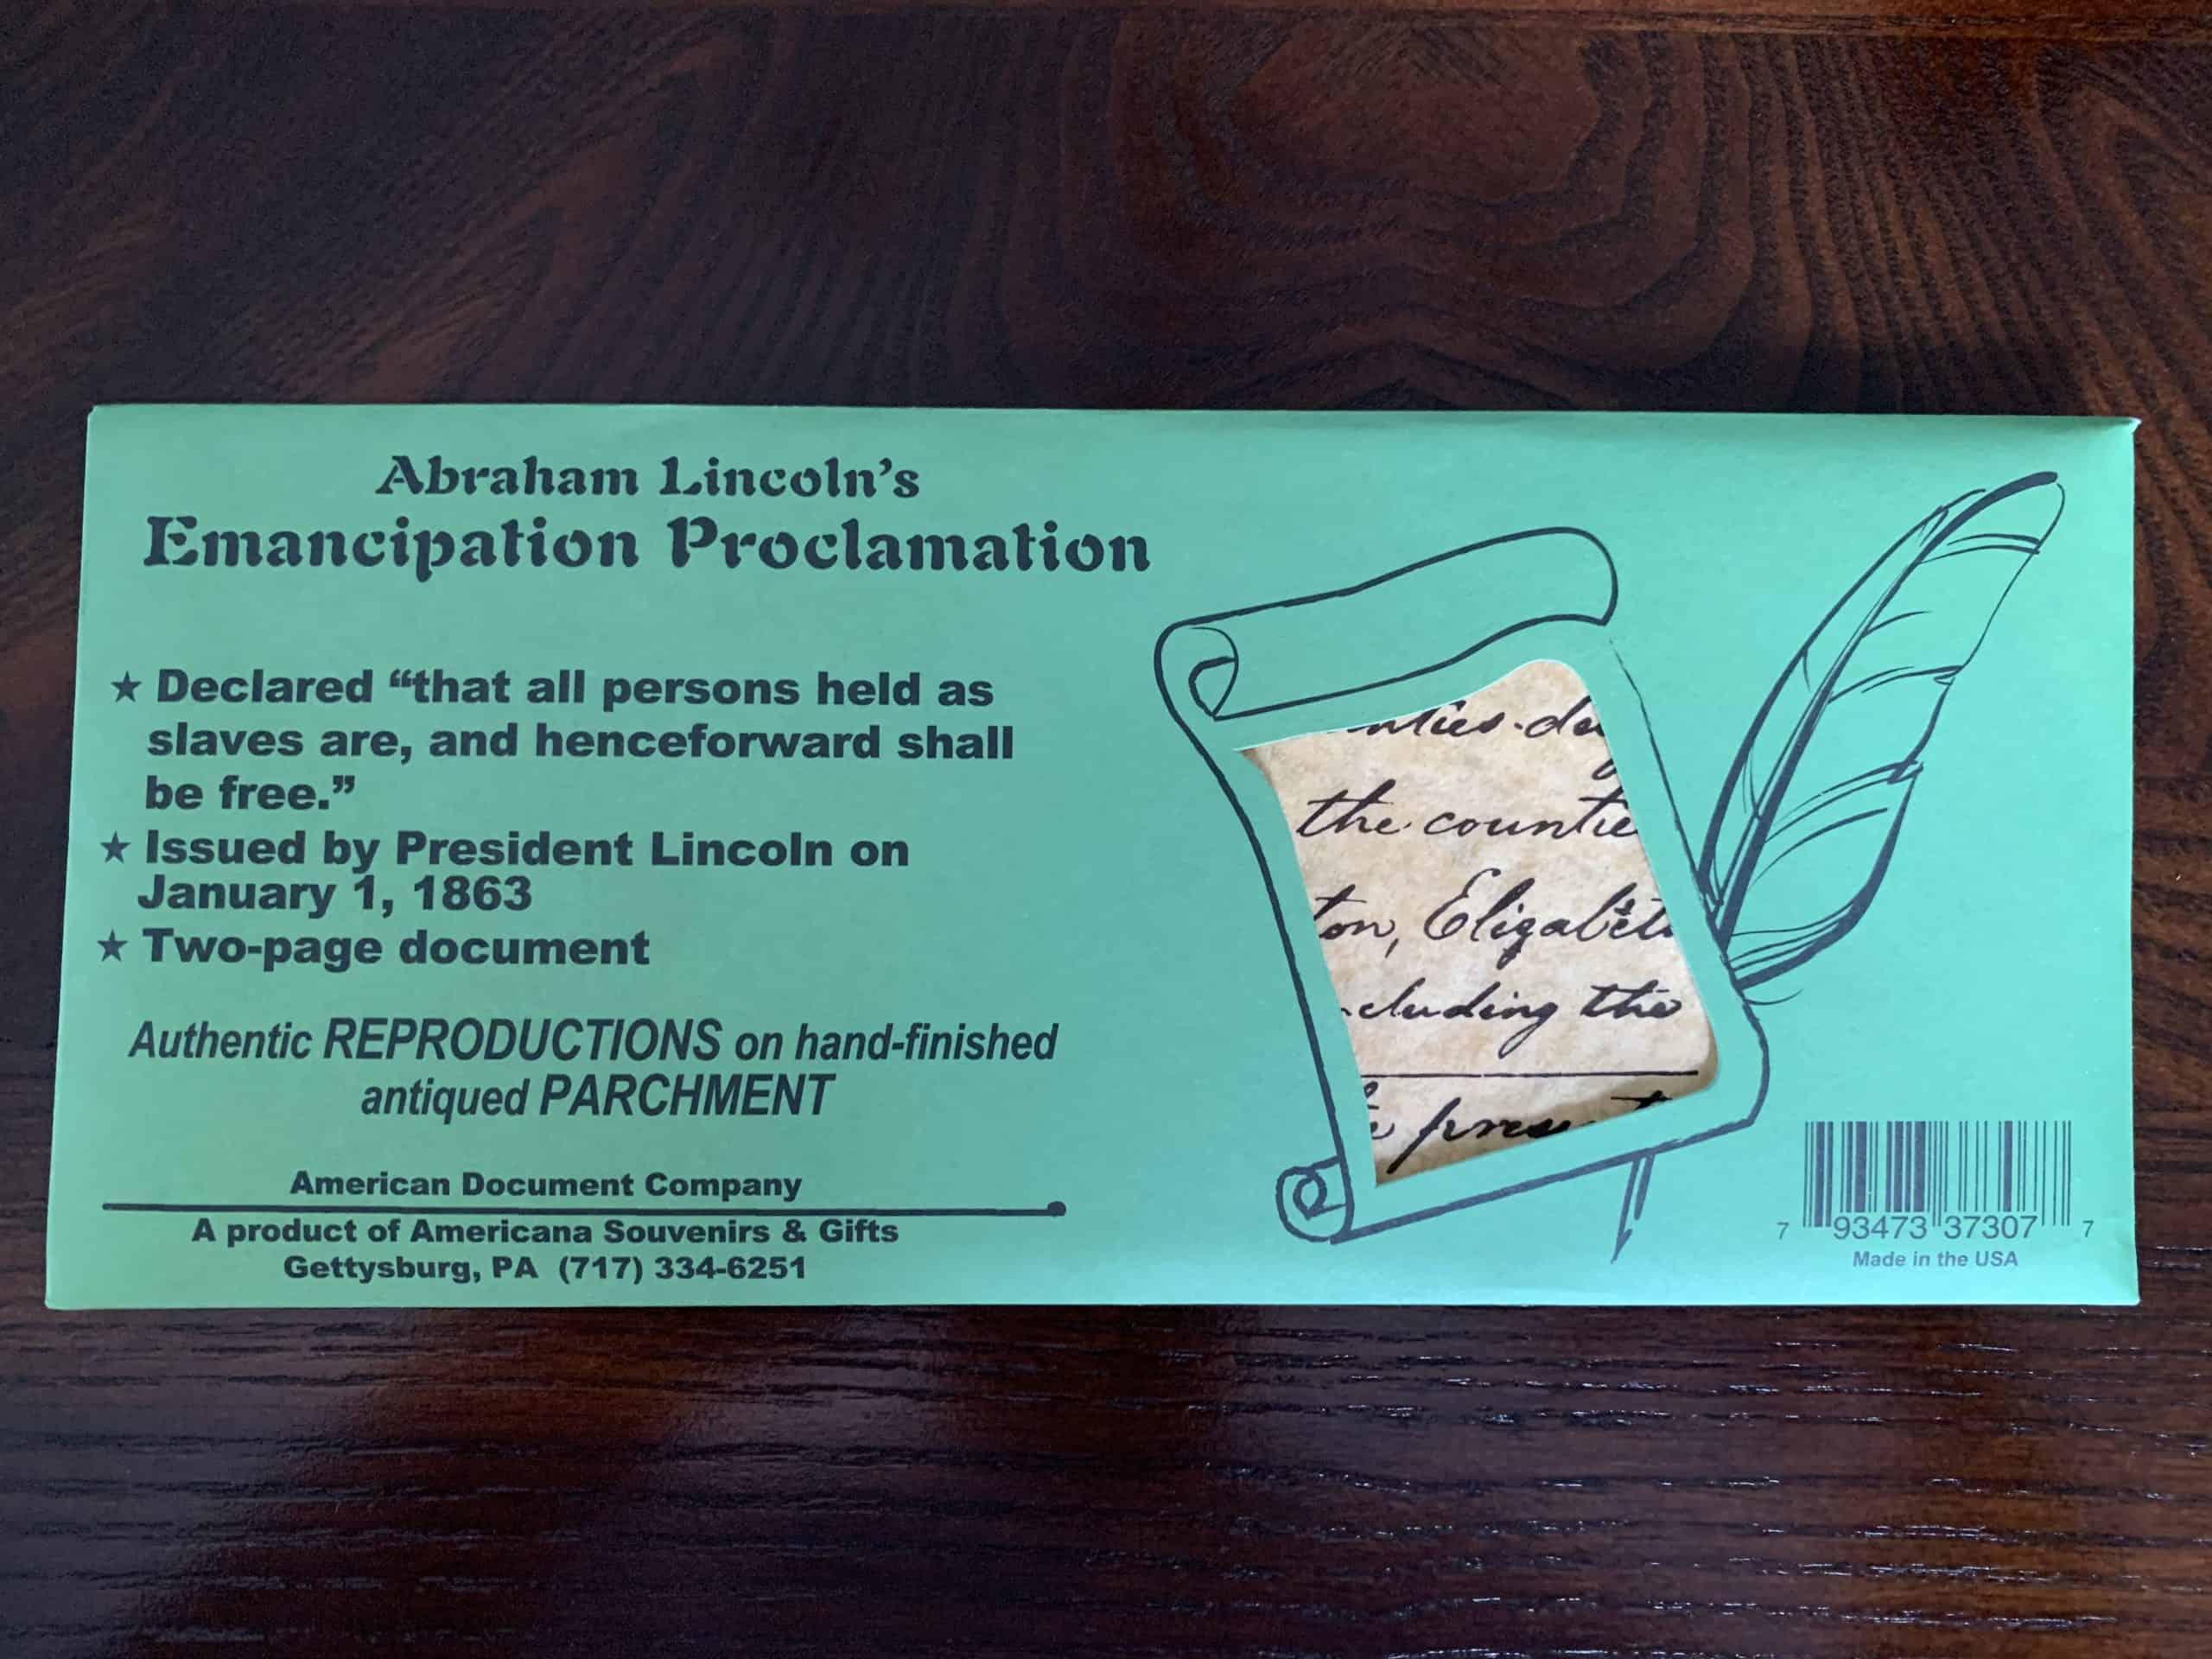 Abraham Lincoln's Emancipation Proclamation - Parchment Replica